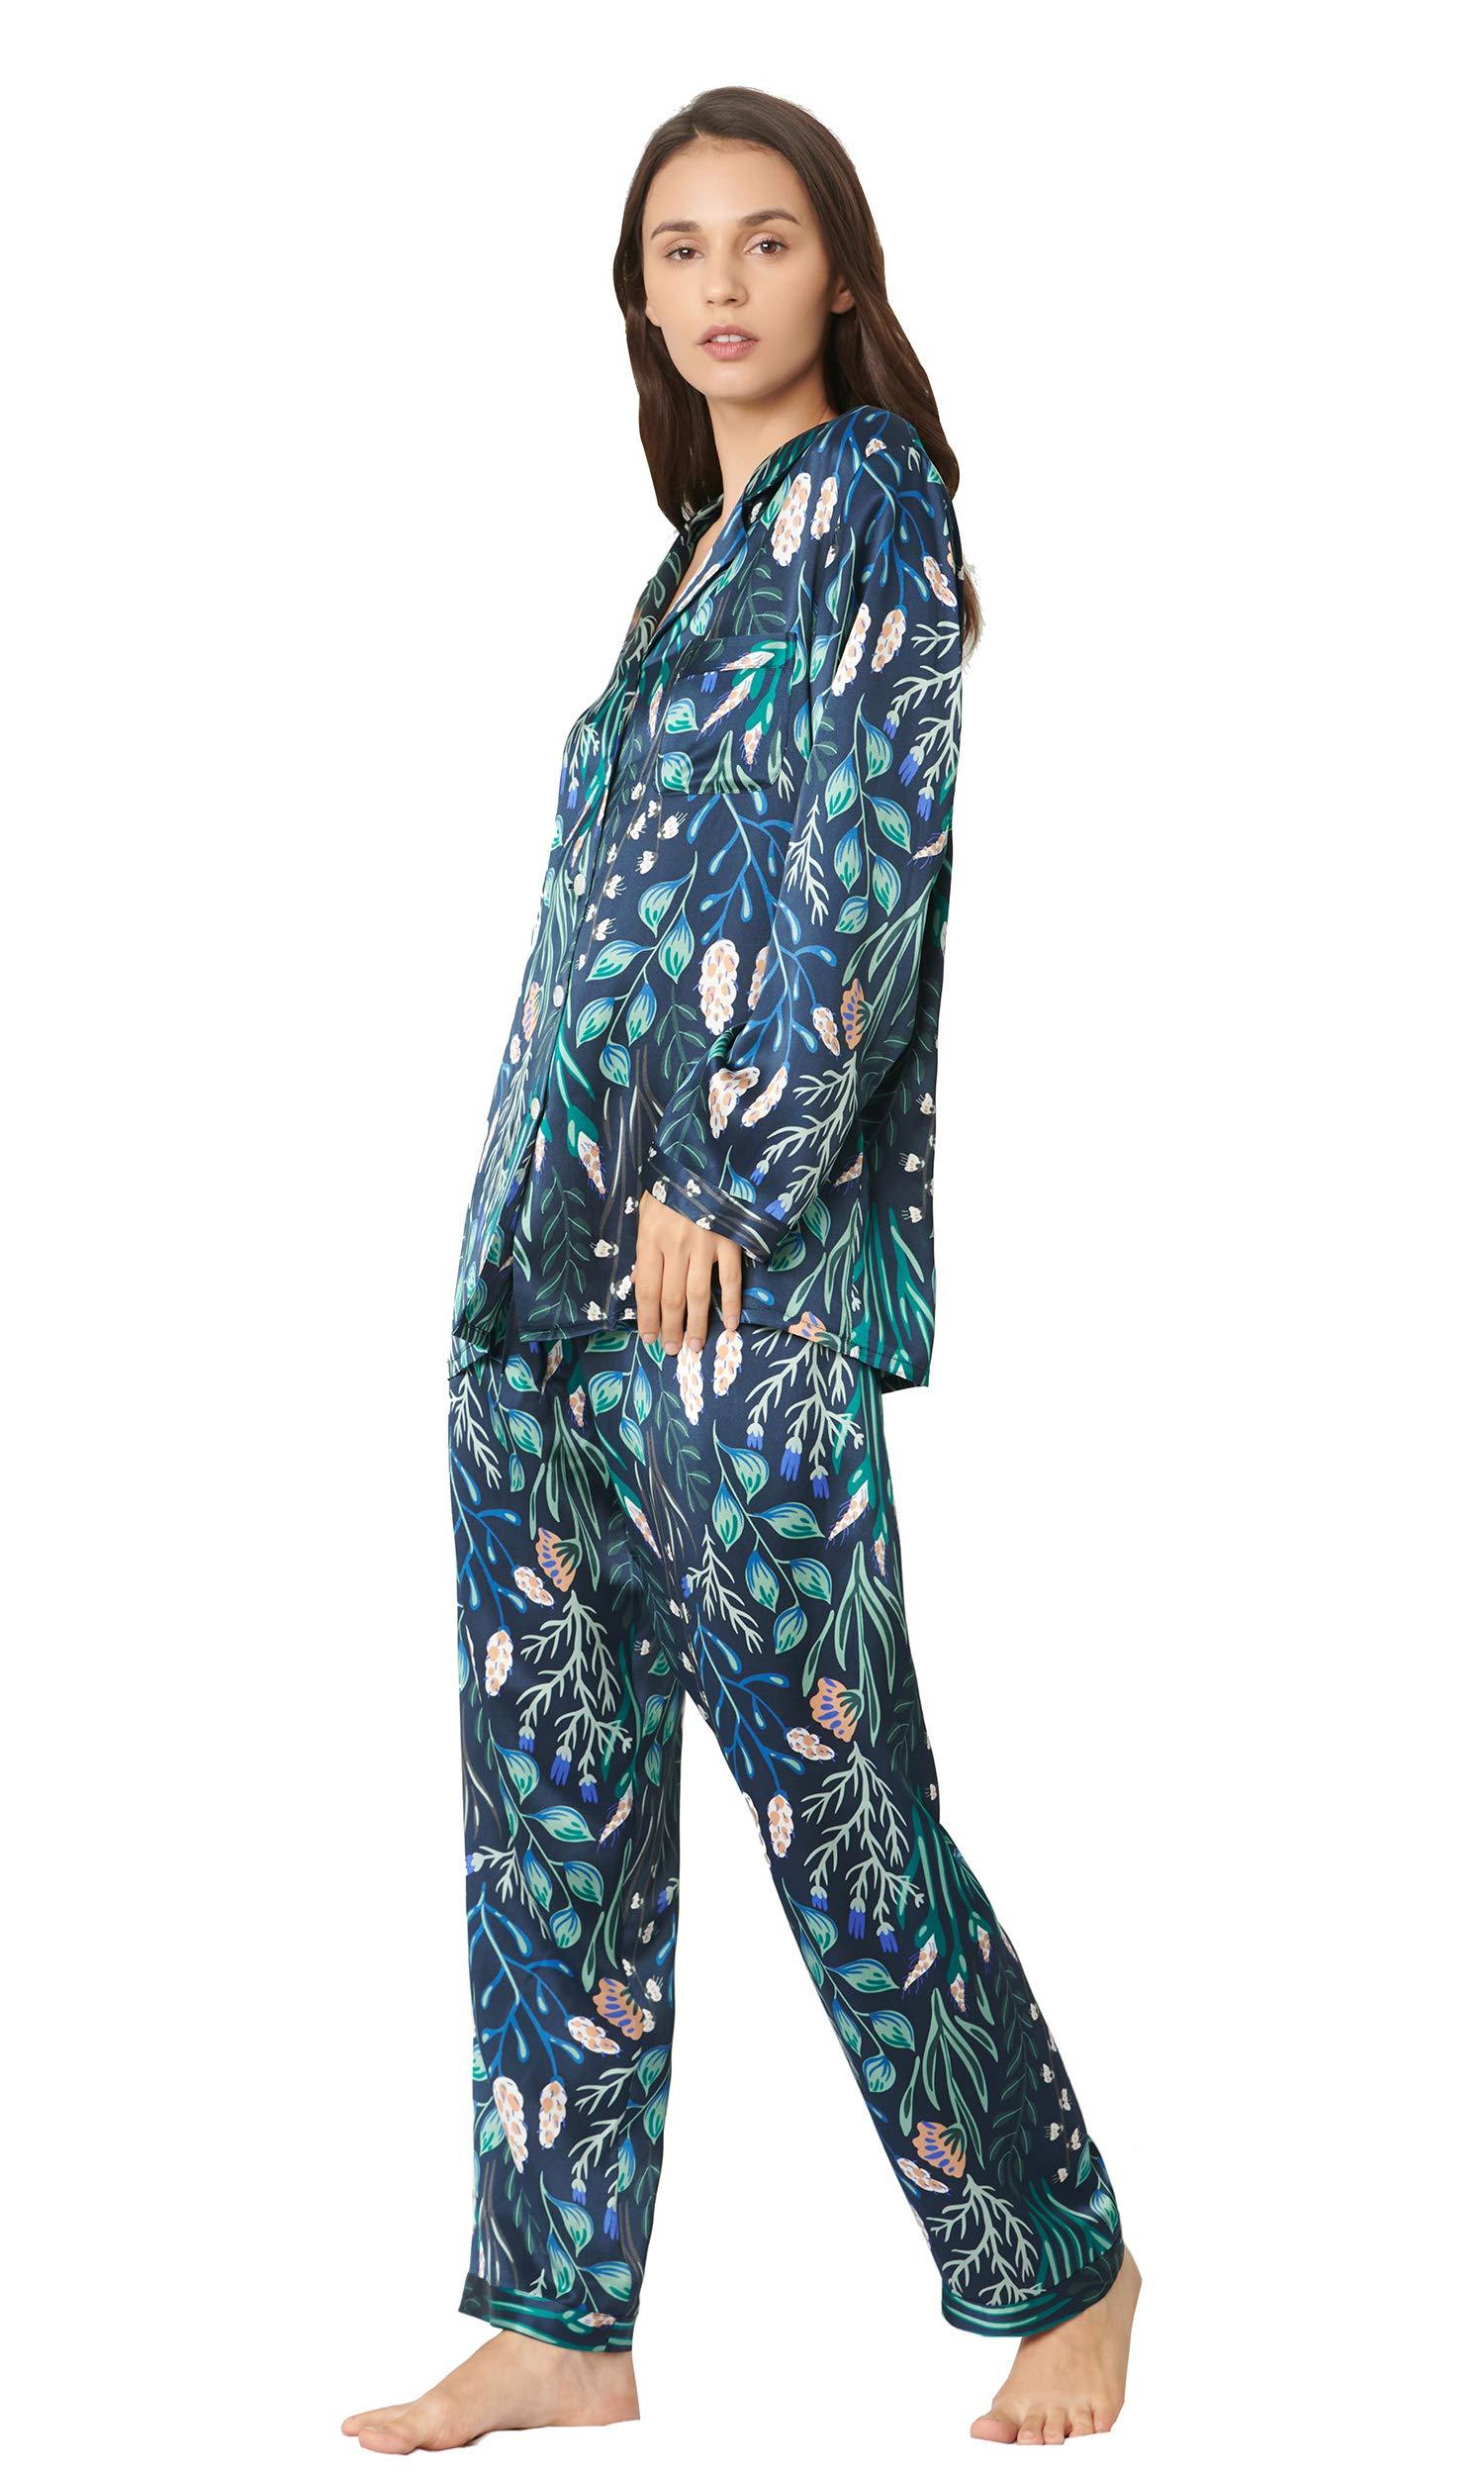 LilySilk Silk Pajamas Set for Women 2 Piece 100 Real Luxury Plant Print Floral Long Silk Pajamas Ladies White Flower with Blue L/12